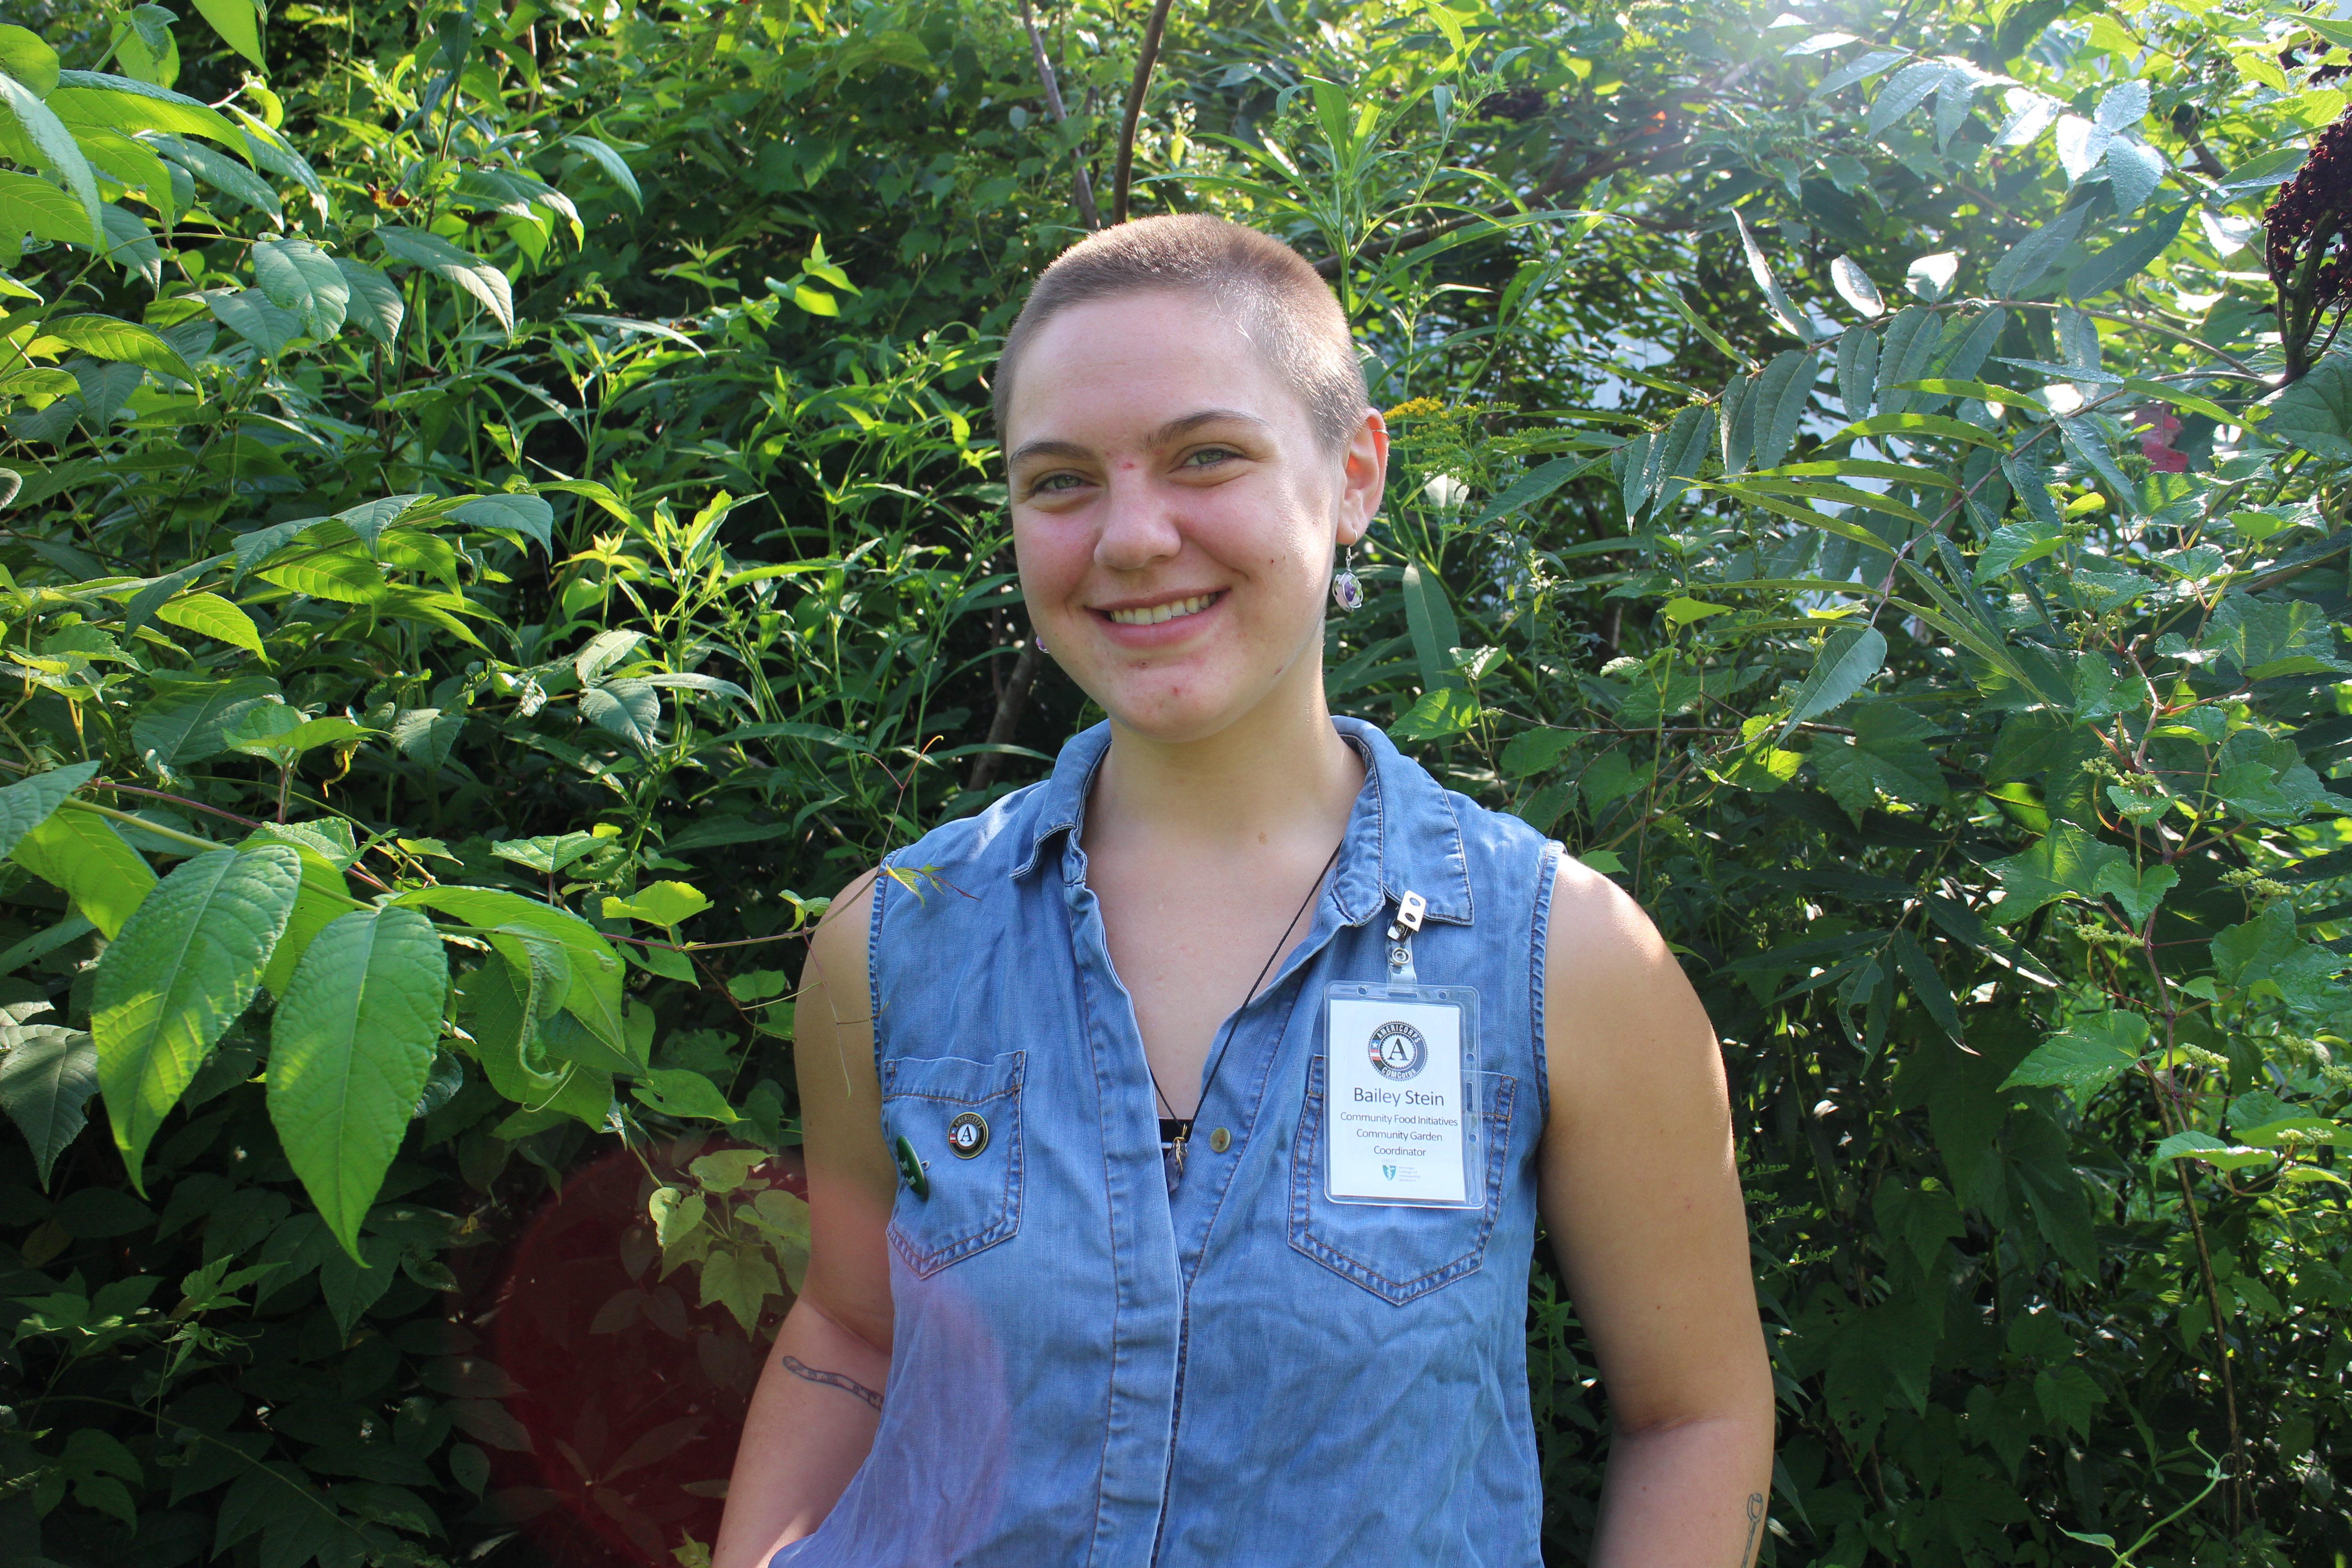 Basil Stein, Garden Programs Coordinator, COMCorps